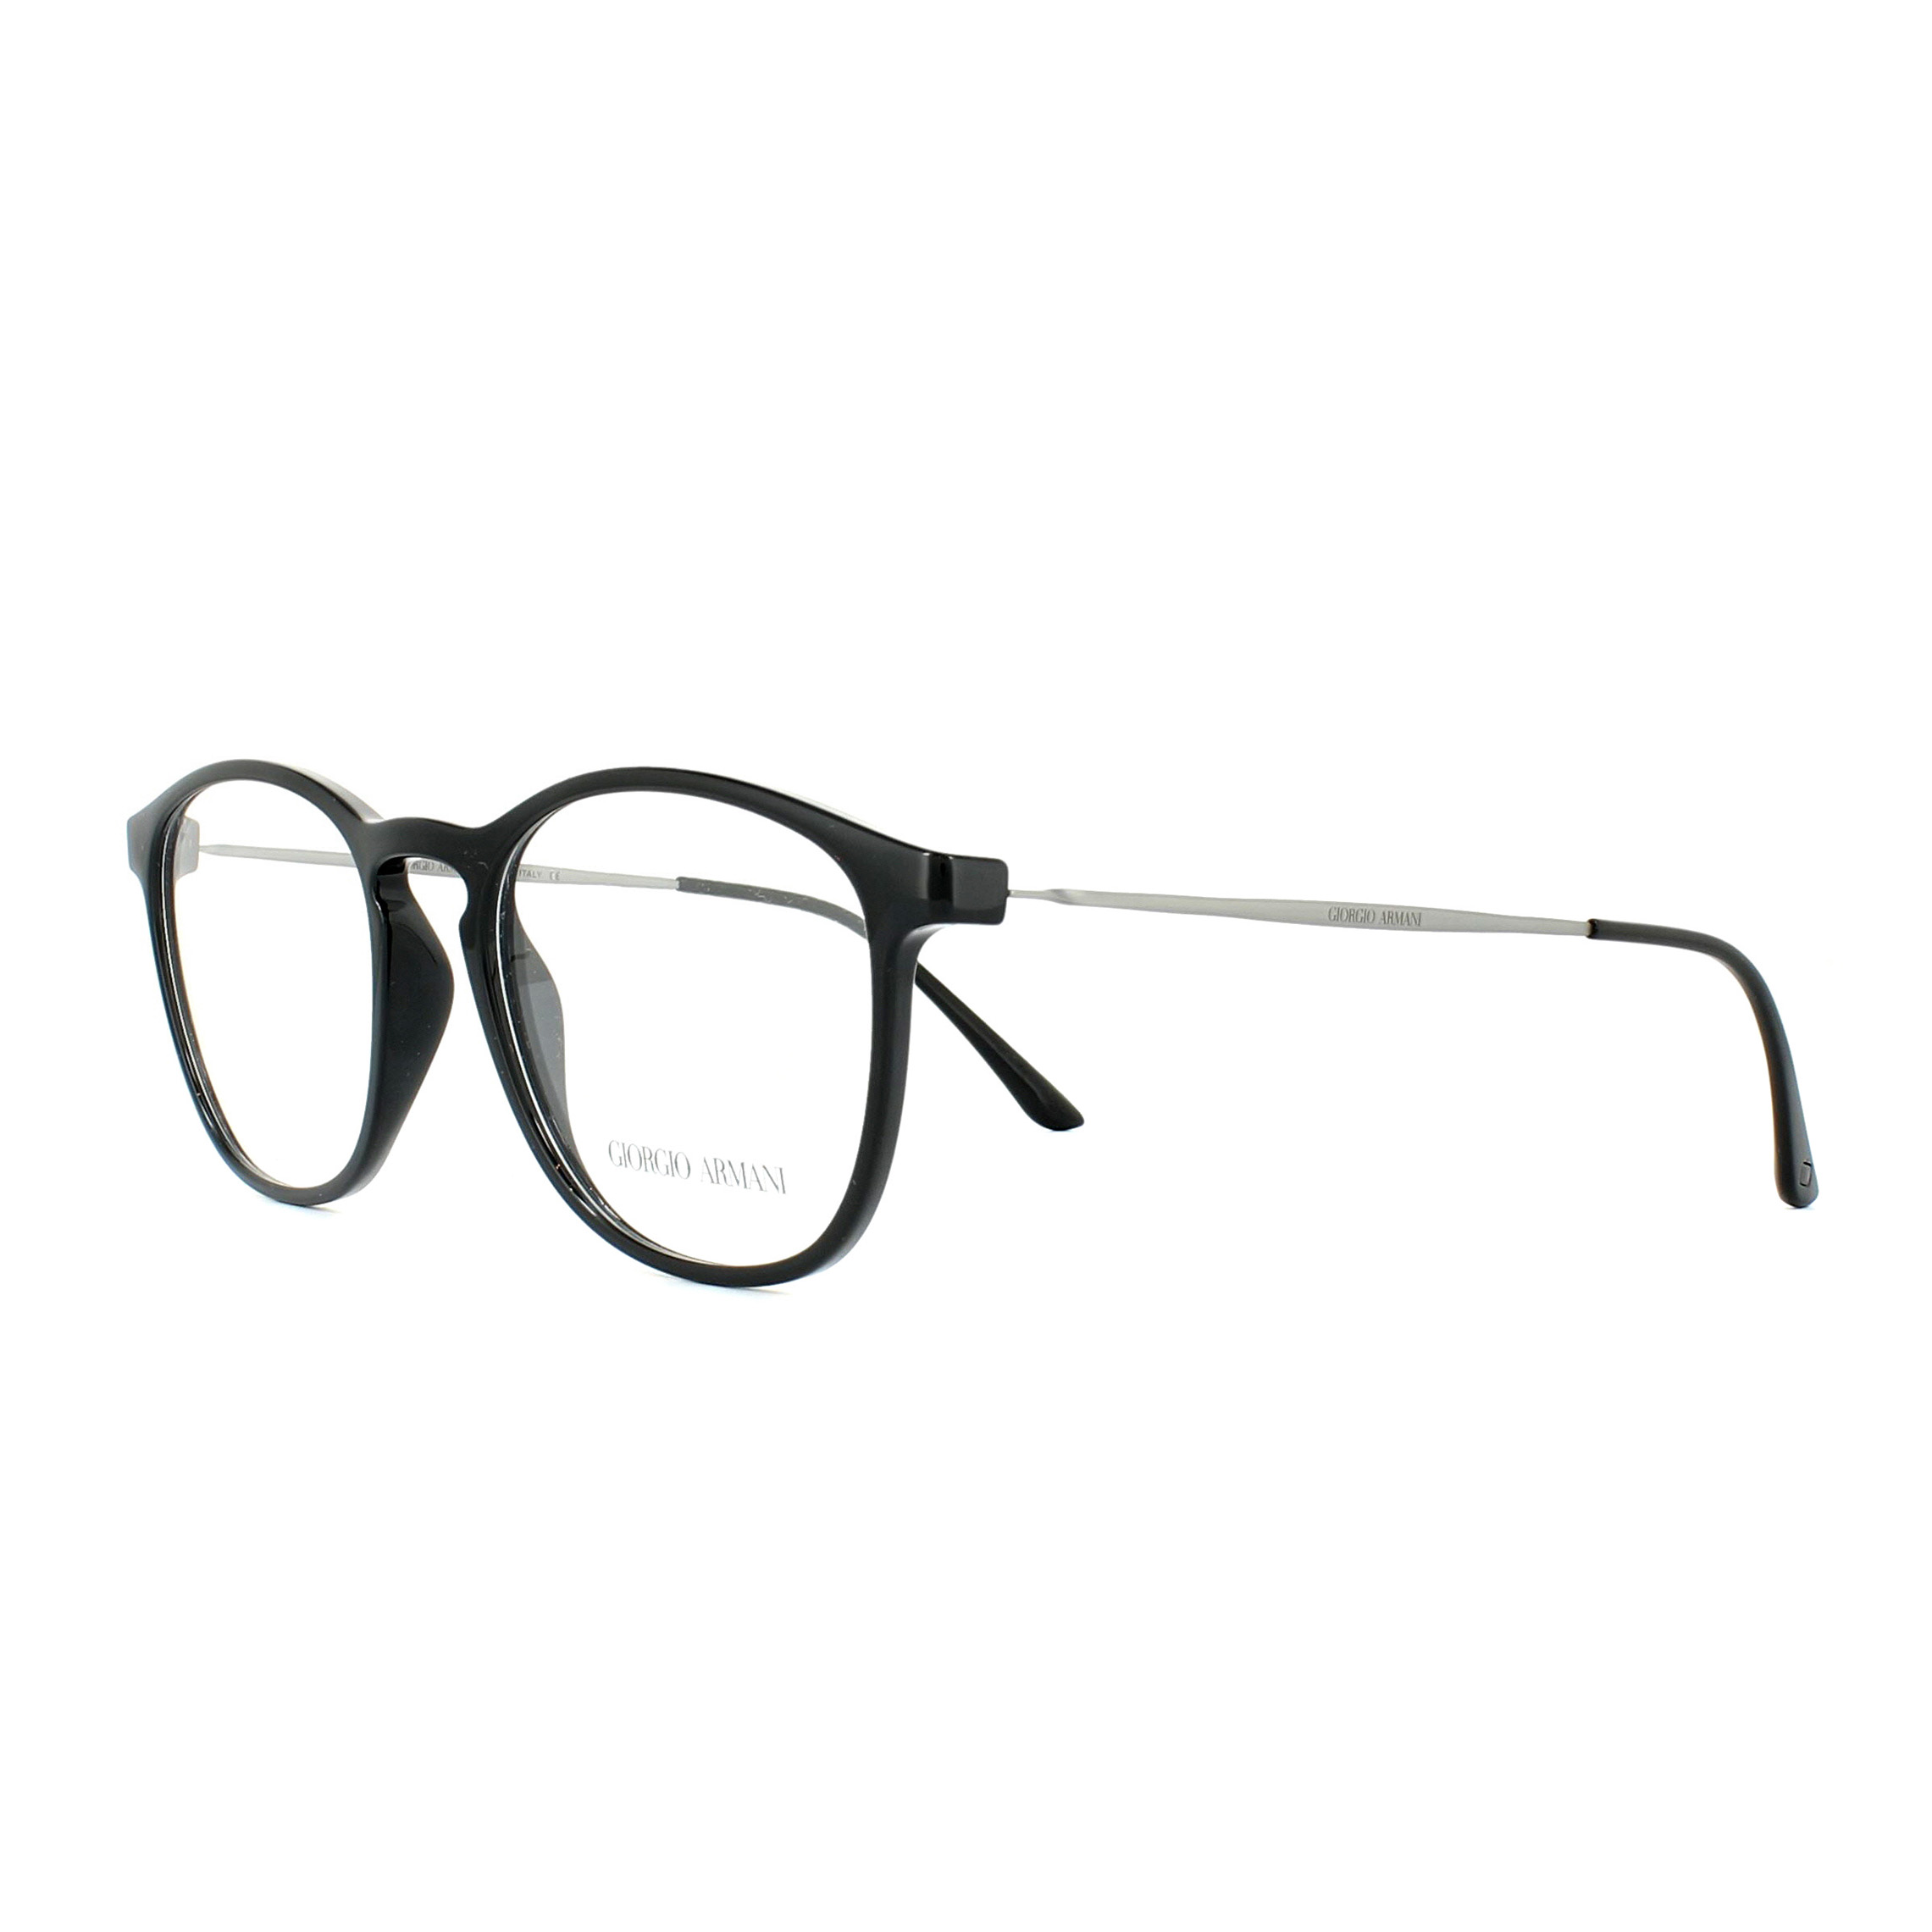 f9ba755559b2 Sentinel Giorgio Armani Glasses Frames AR7141 5017 Black 52mm Mens